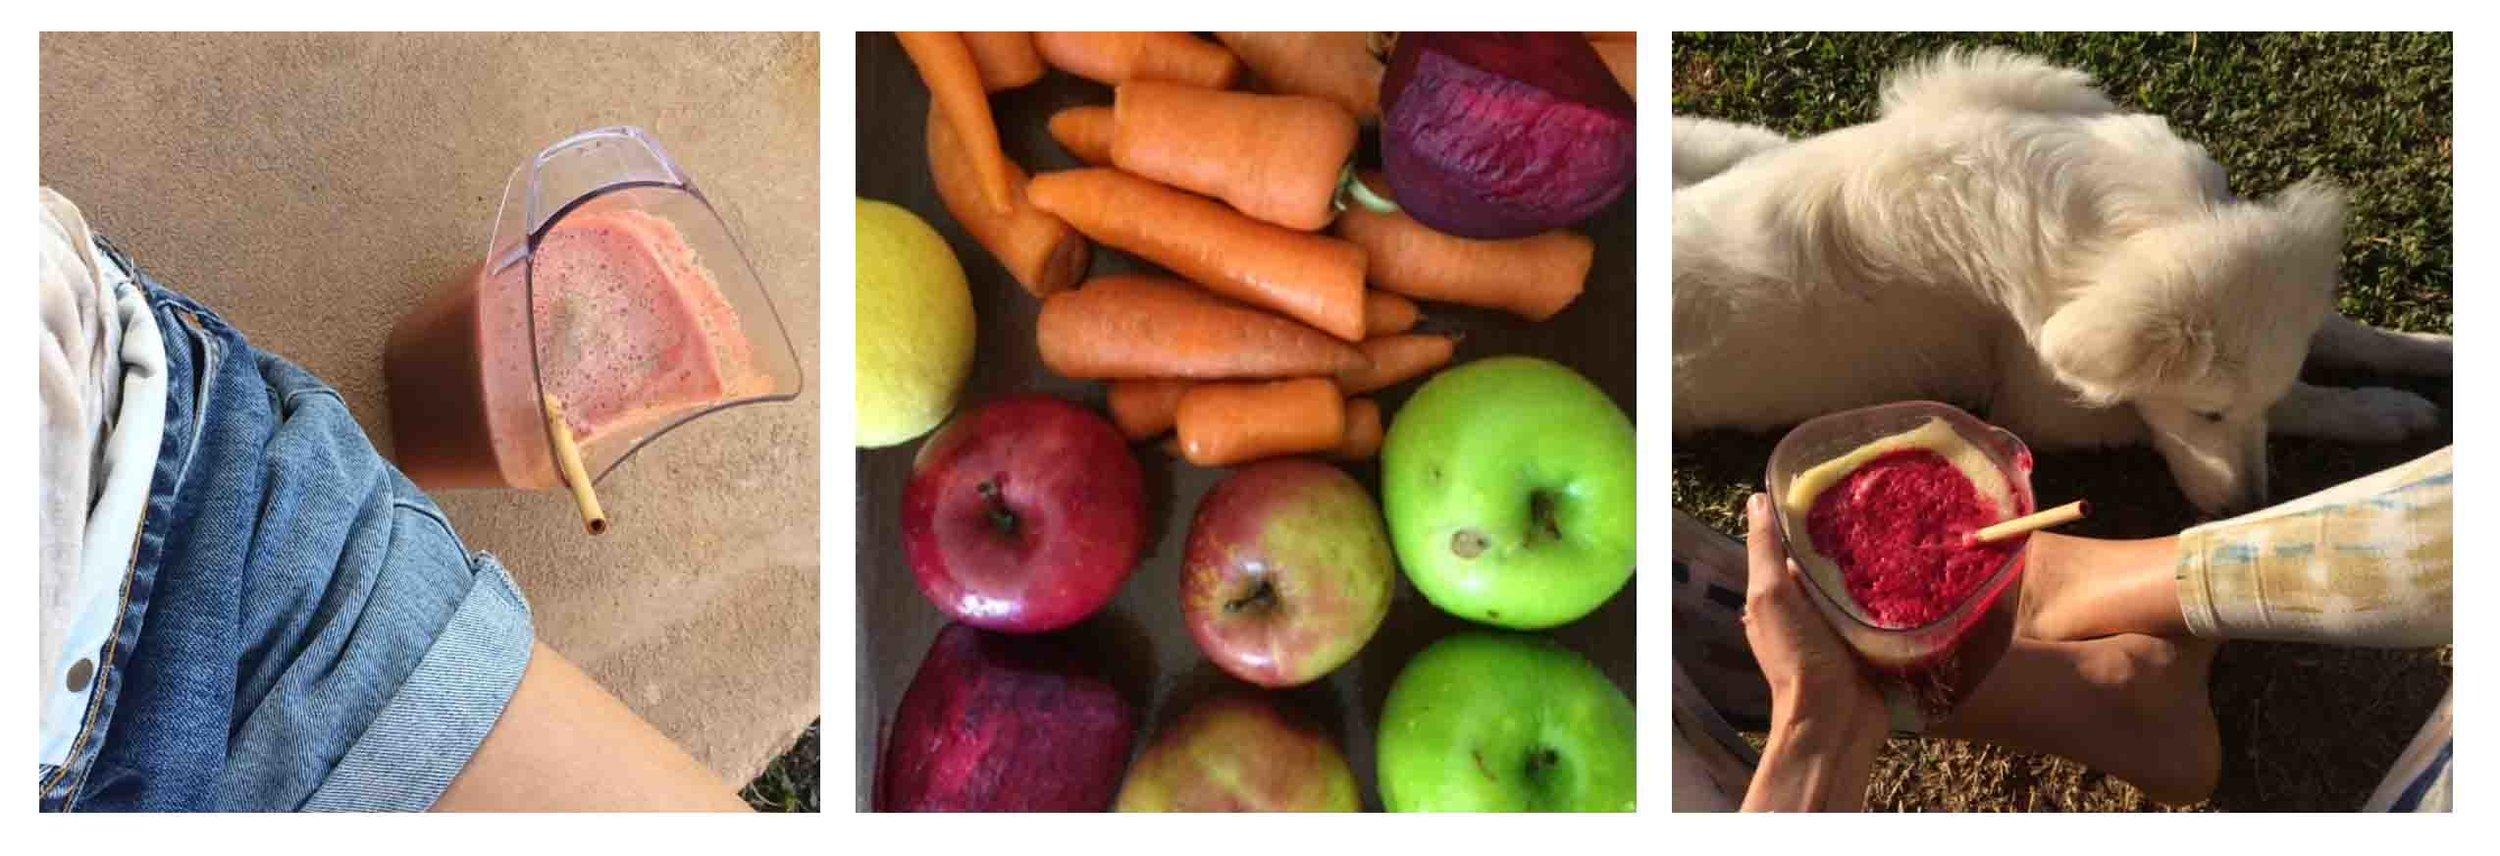 www.51raw.com-sarah-vosper-30-day-juice-cleanse.jpg